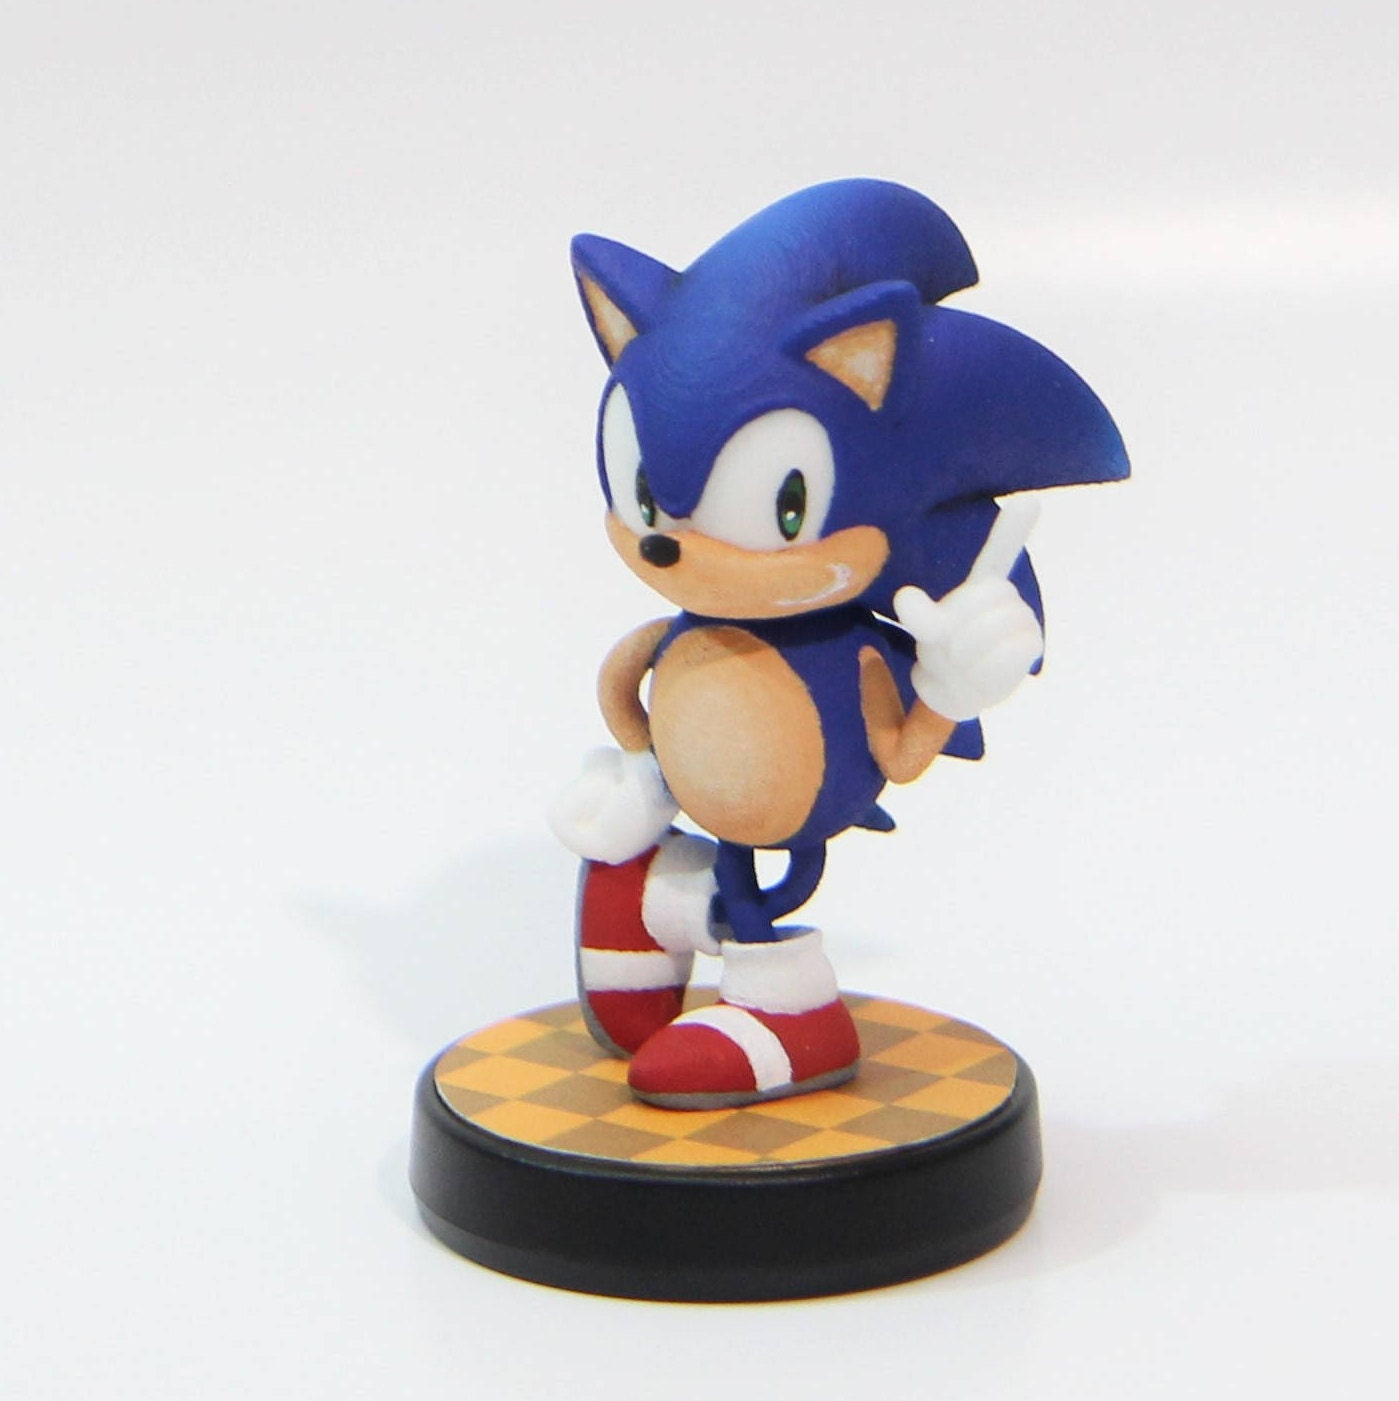 Benutzerdefinierte Amiibo klassische Pose Sonic Sonic Mania | Etsy